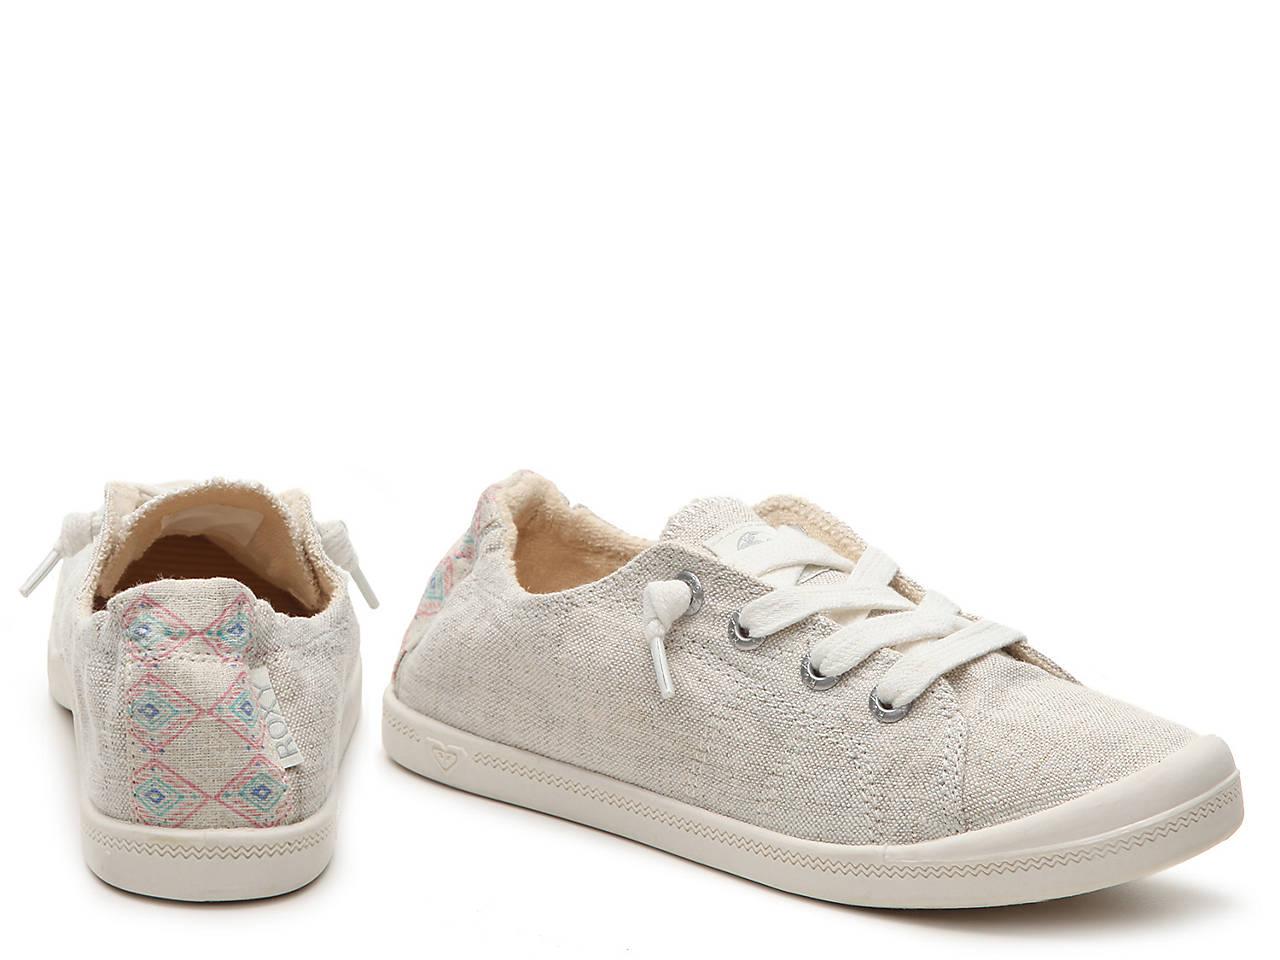 b4f1000487e50 Bayshore Slip-On Sneaker